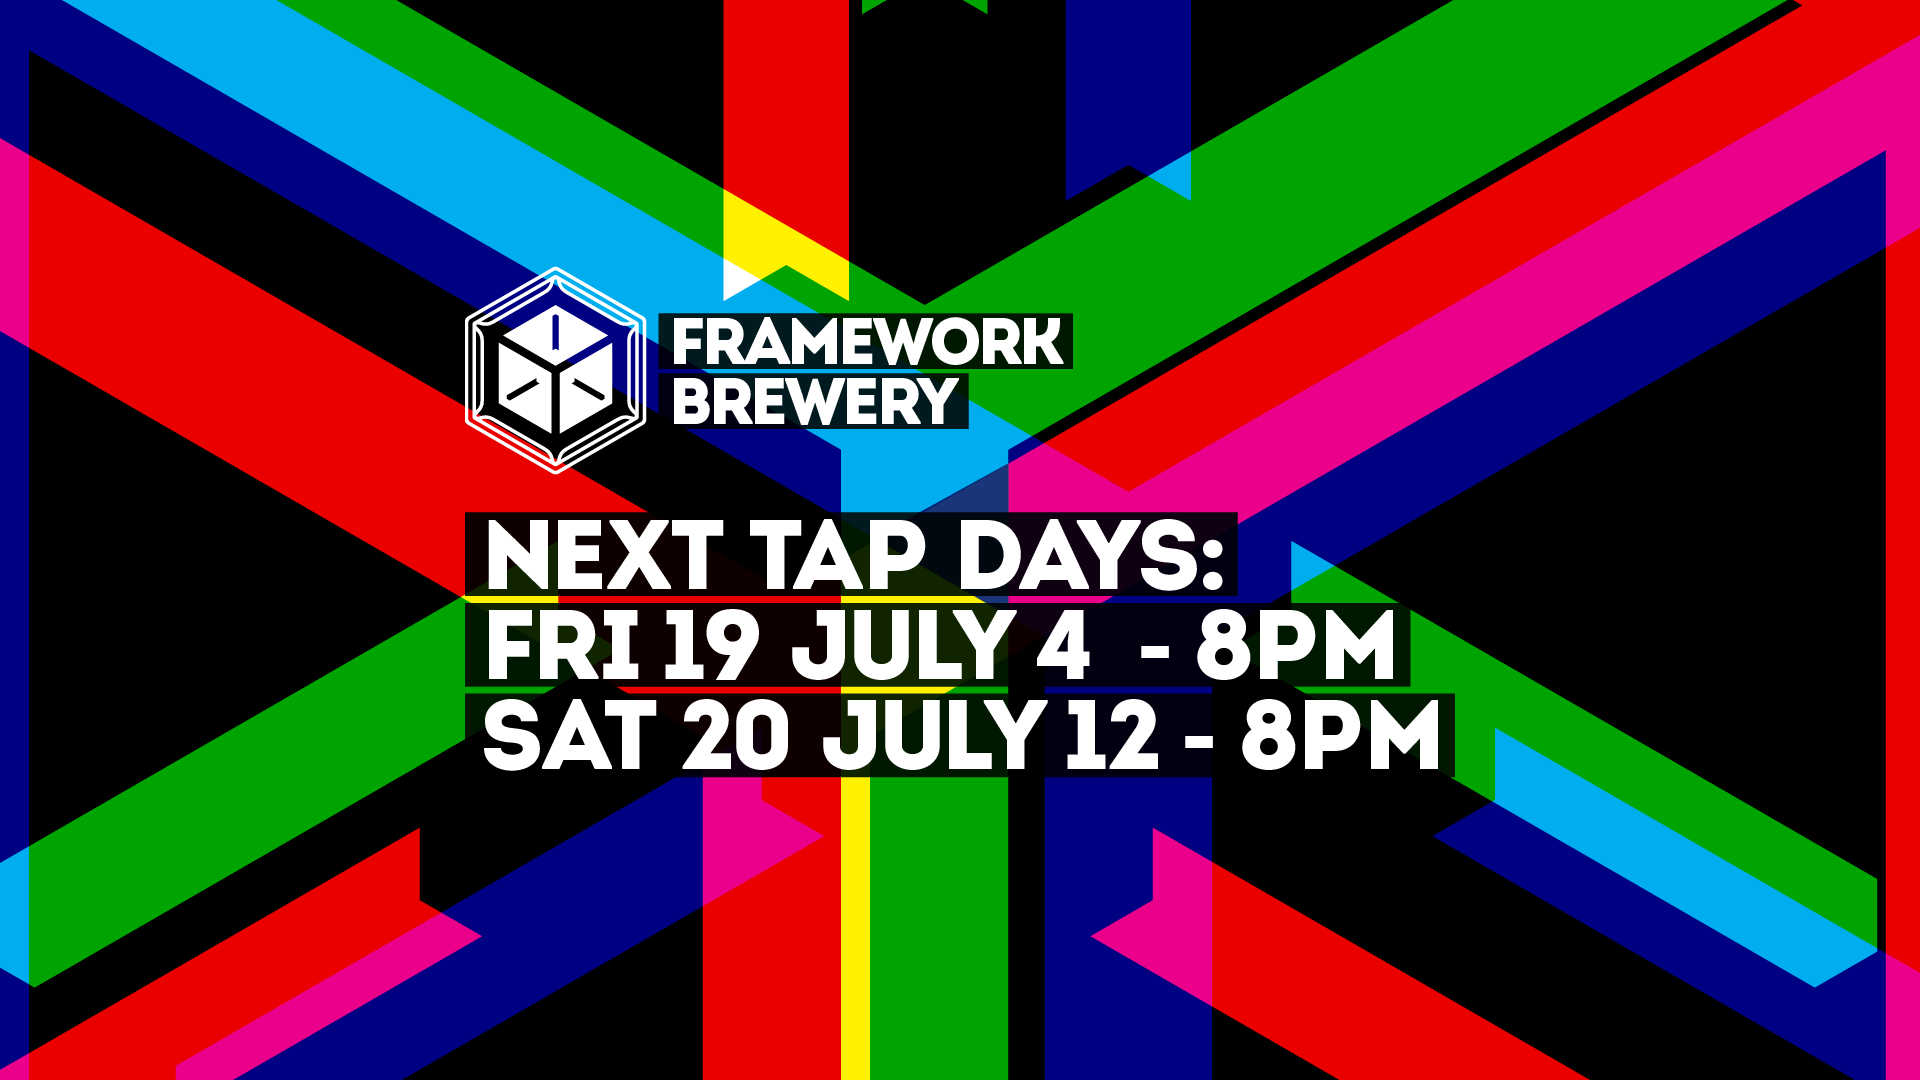 FRMWRK_WBSTE_TAP_DAYS_JULY-01.png